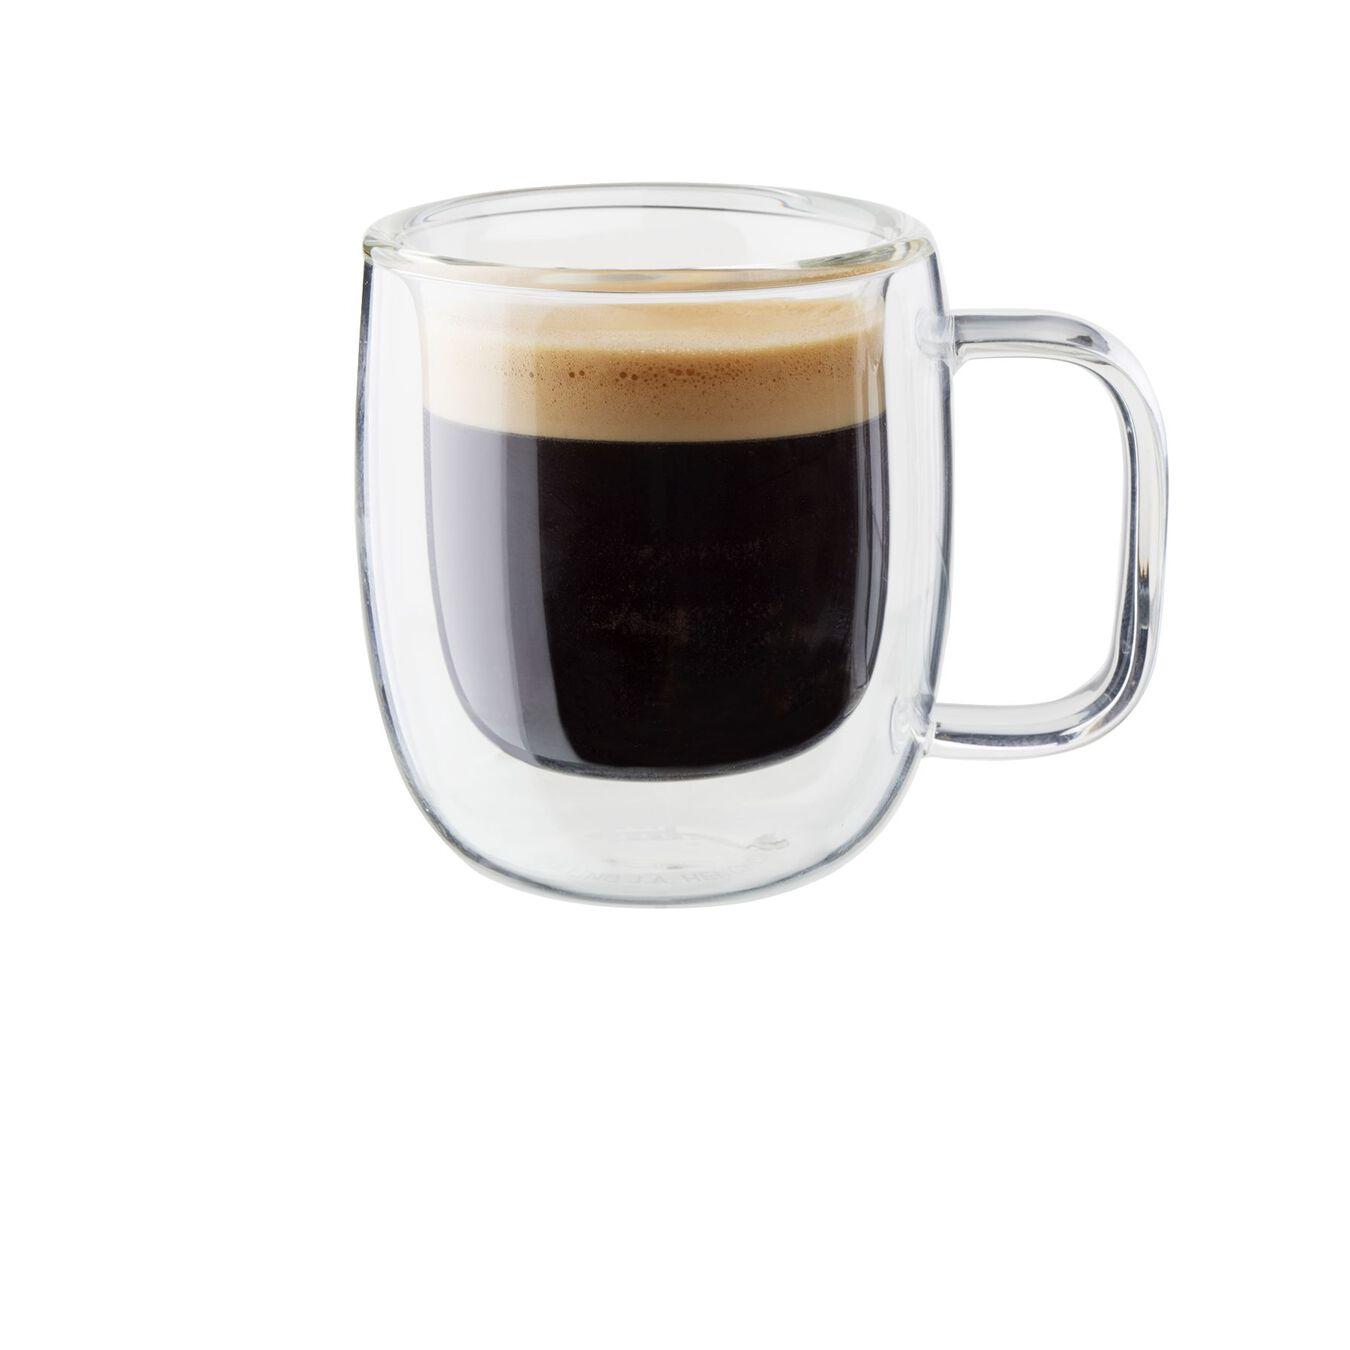 2-pc Double-Wall Glass Espresso Mug Set,,large 1